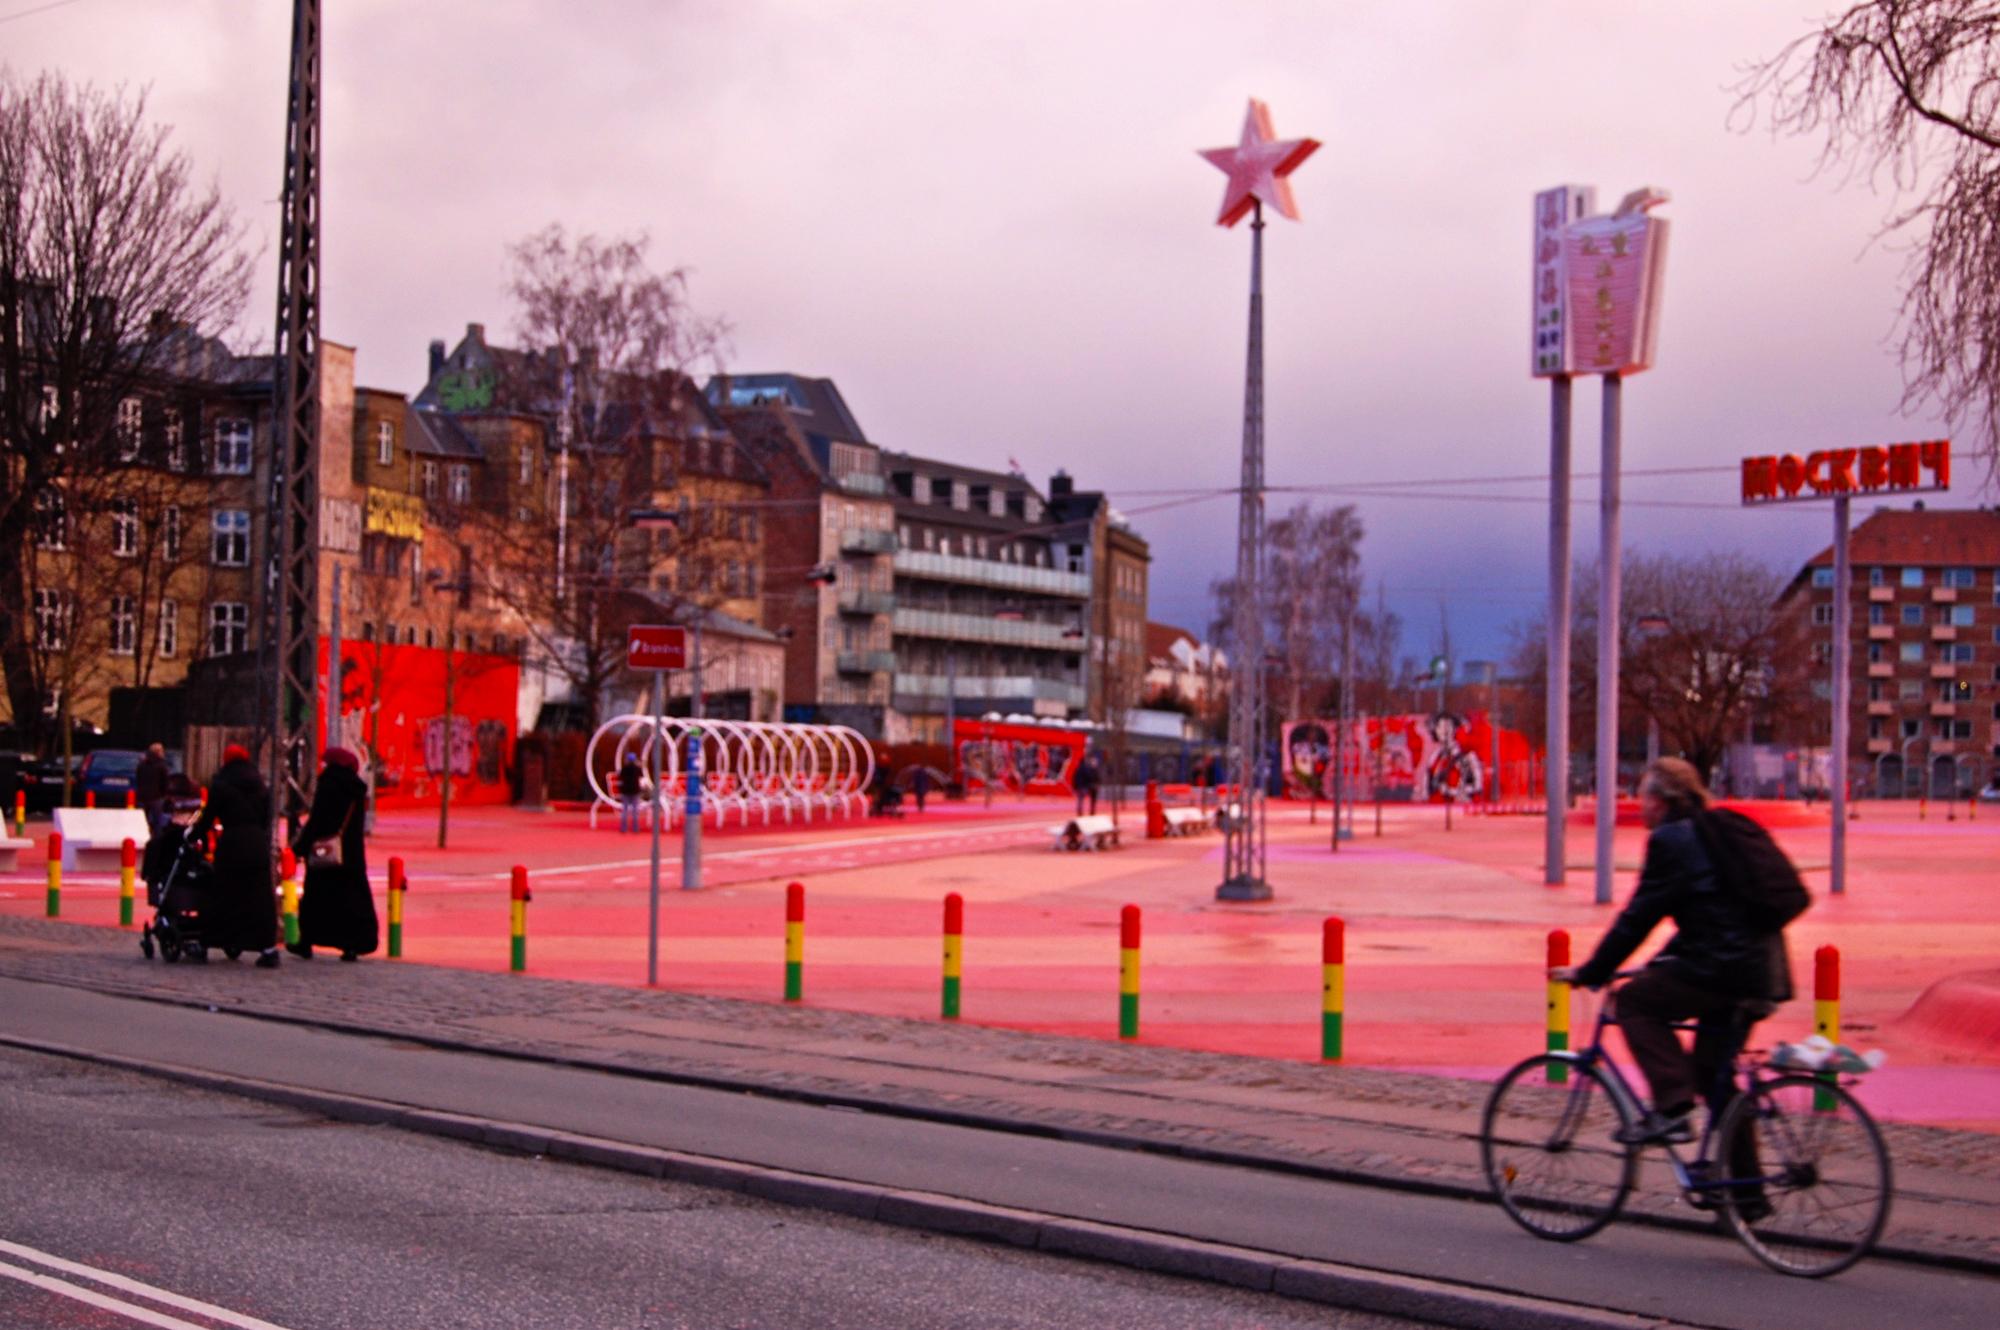 BIG's Superkilen park in Nørrebro